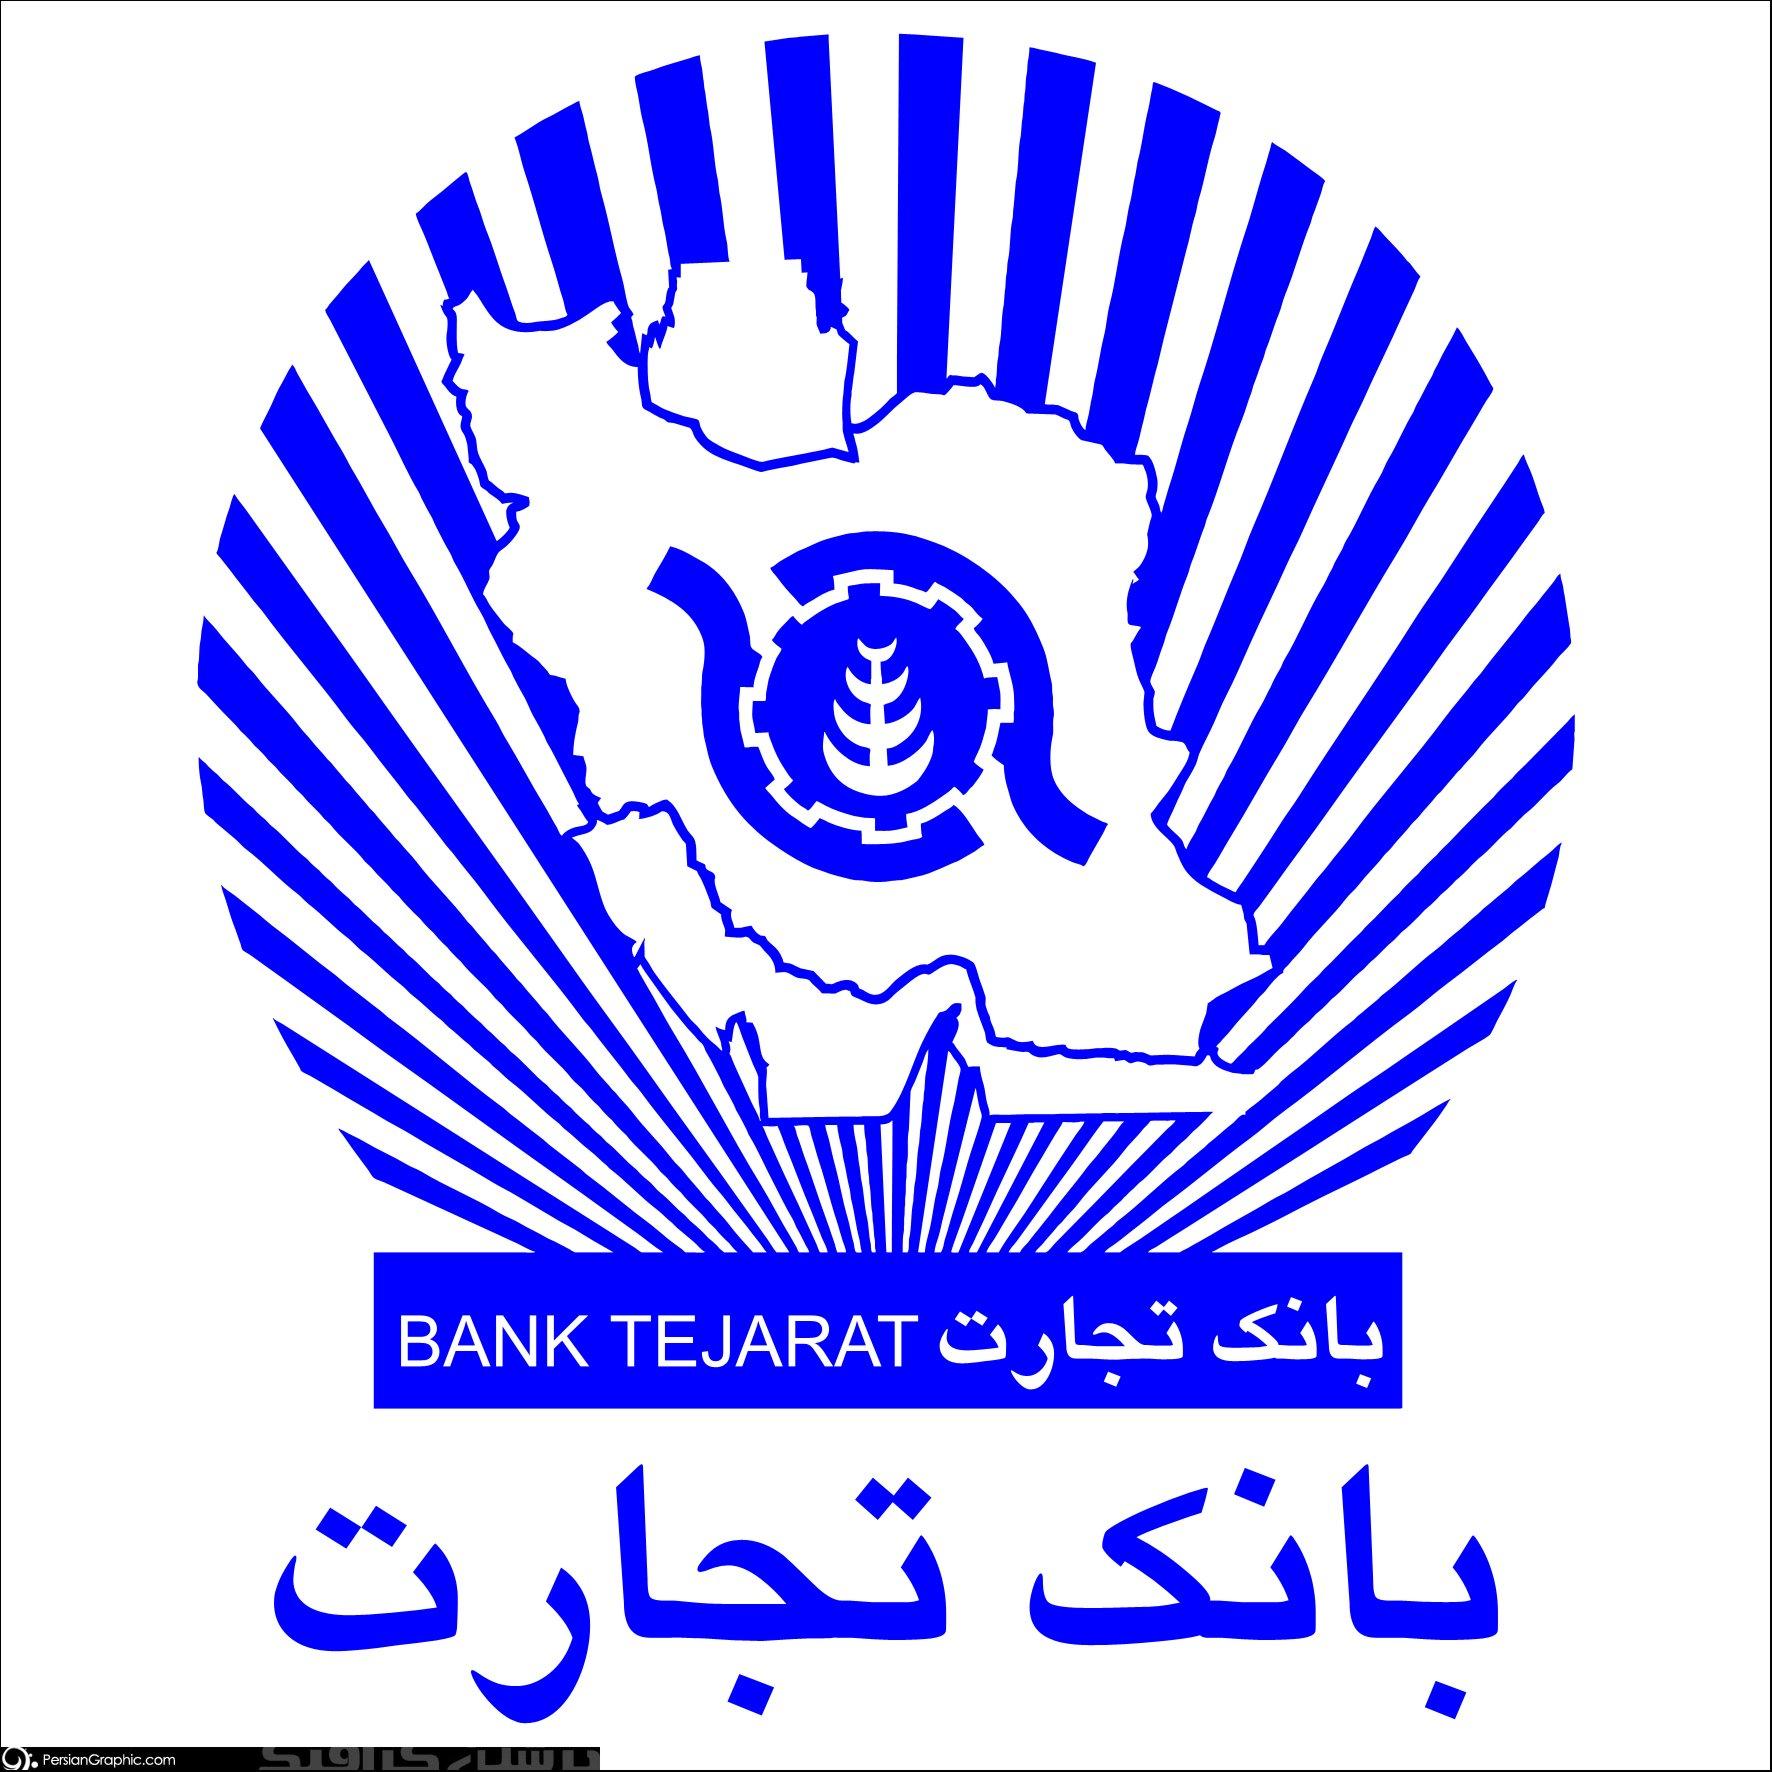 Bank Tejarat Logo photo - 1